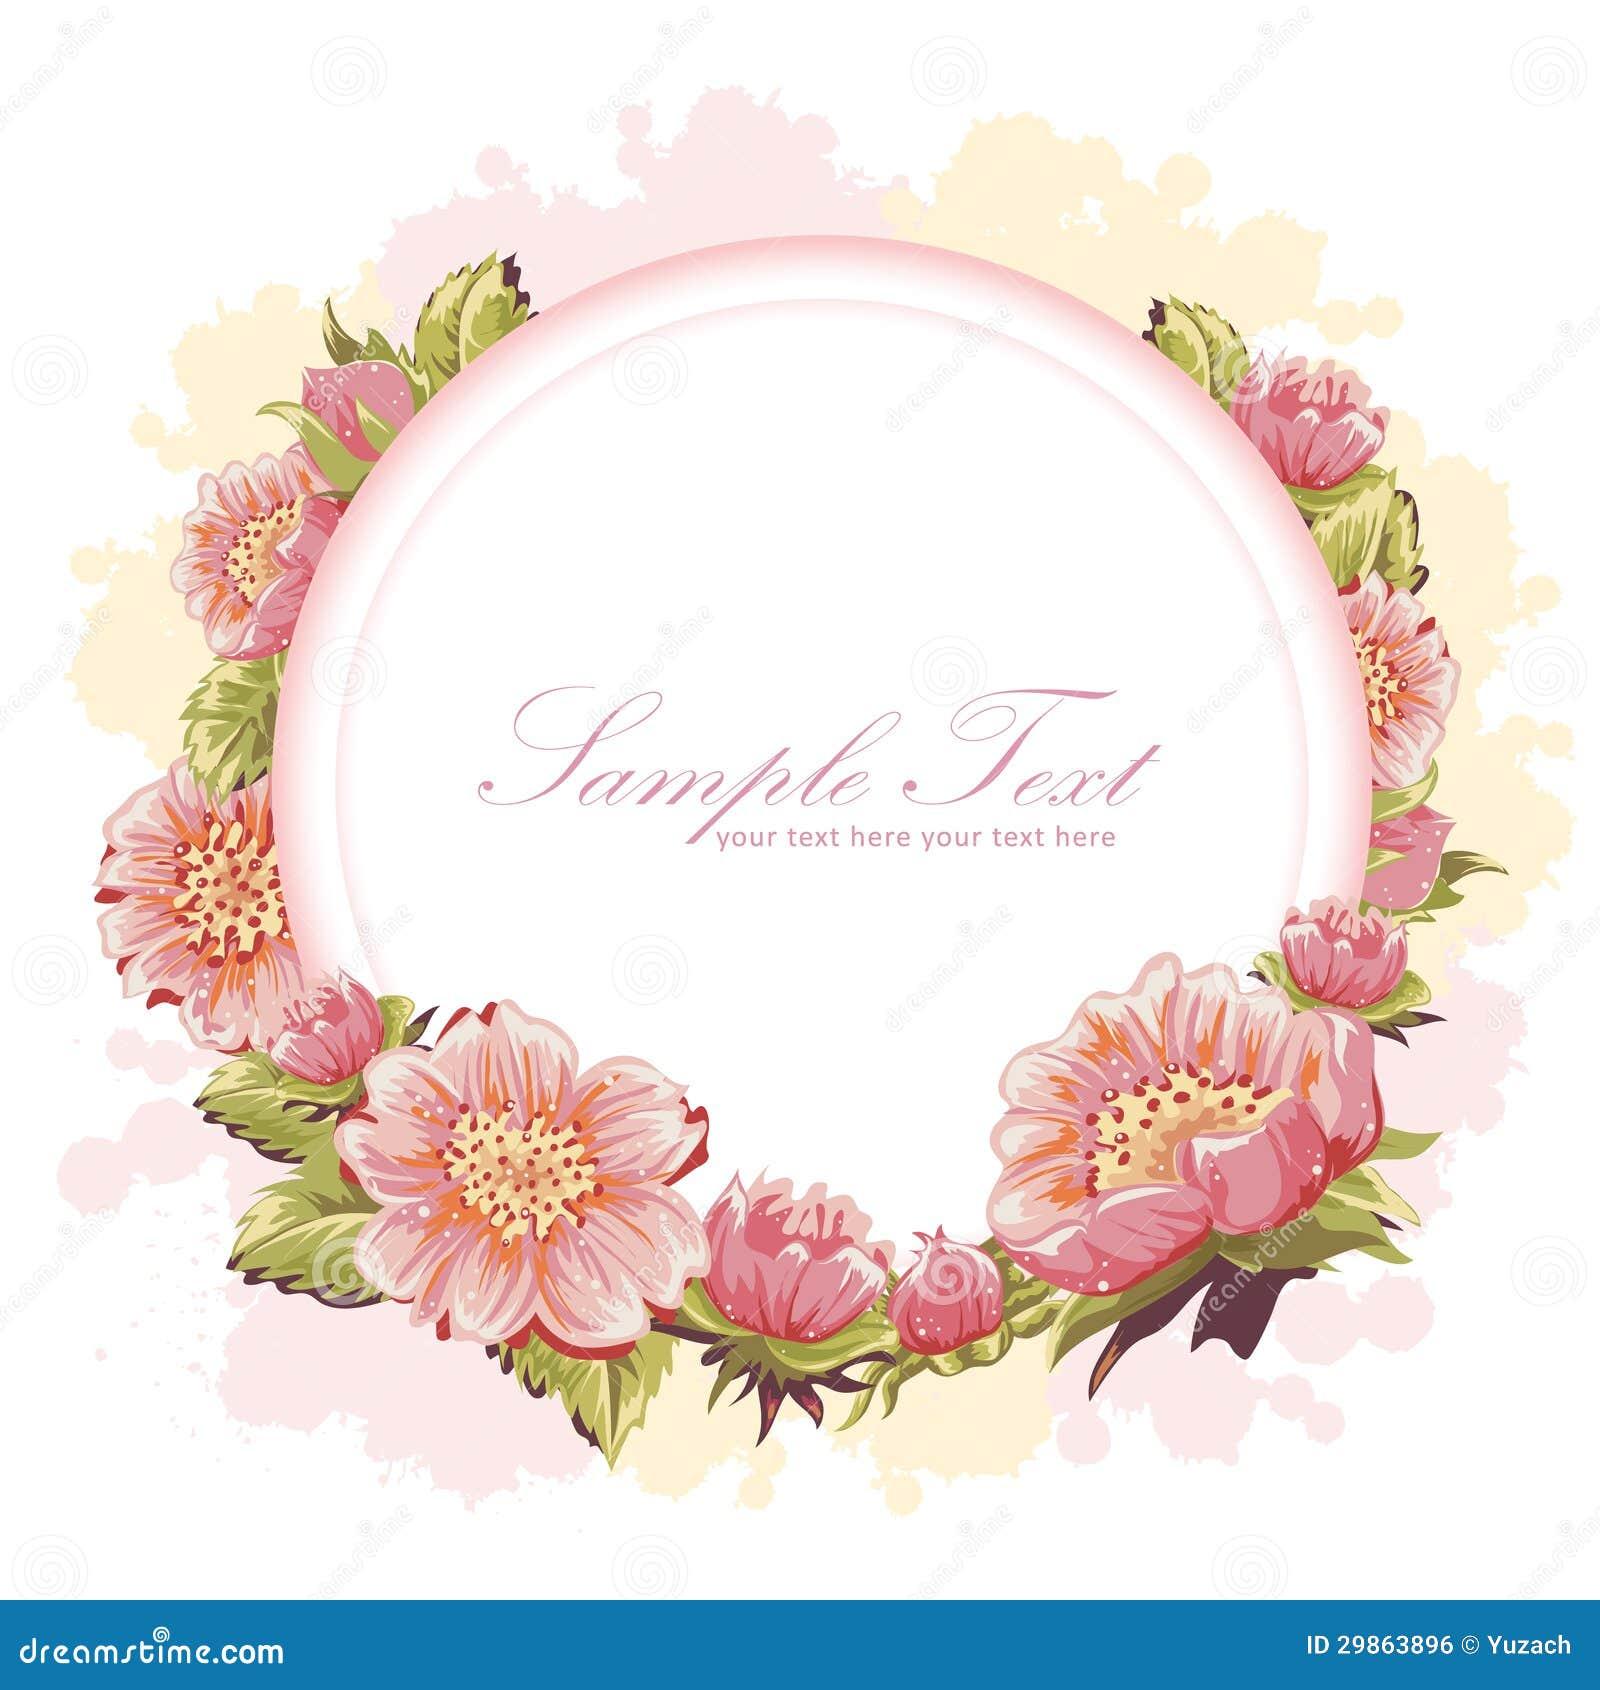 Elegant Flower Invitation Postcard Royalty Free Stock Image